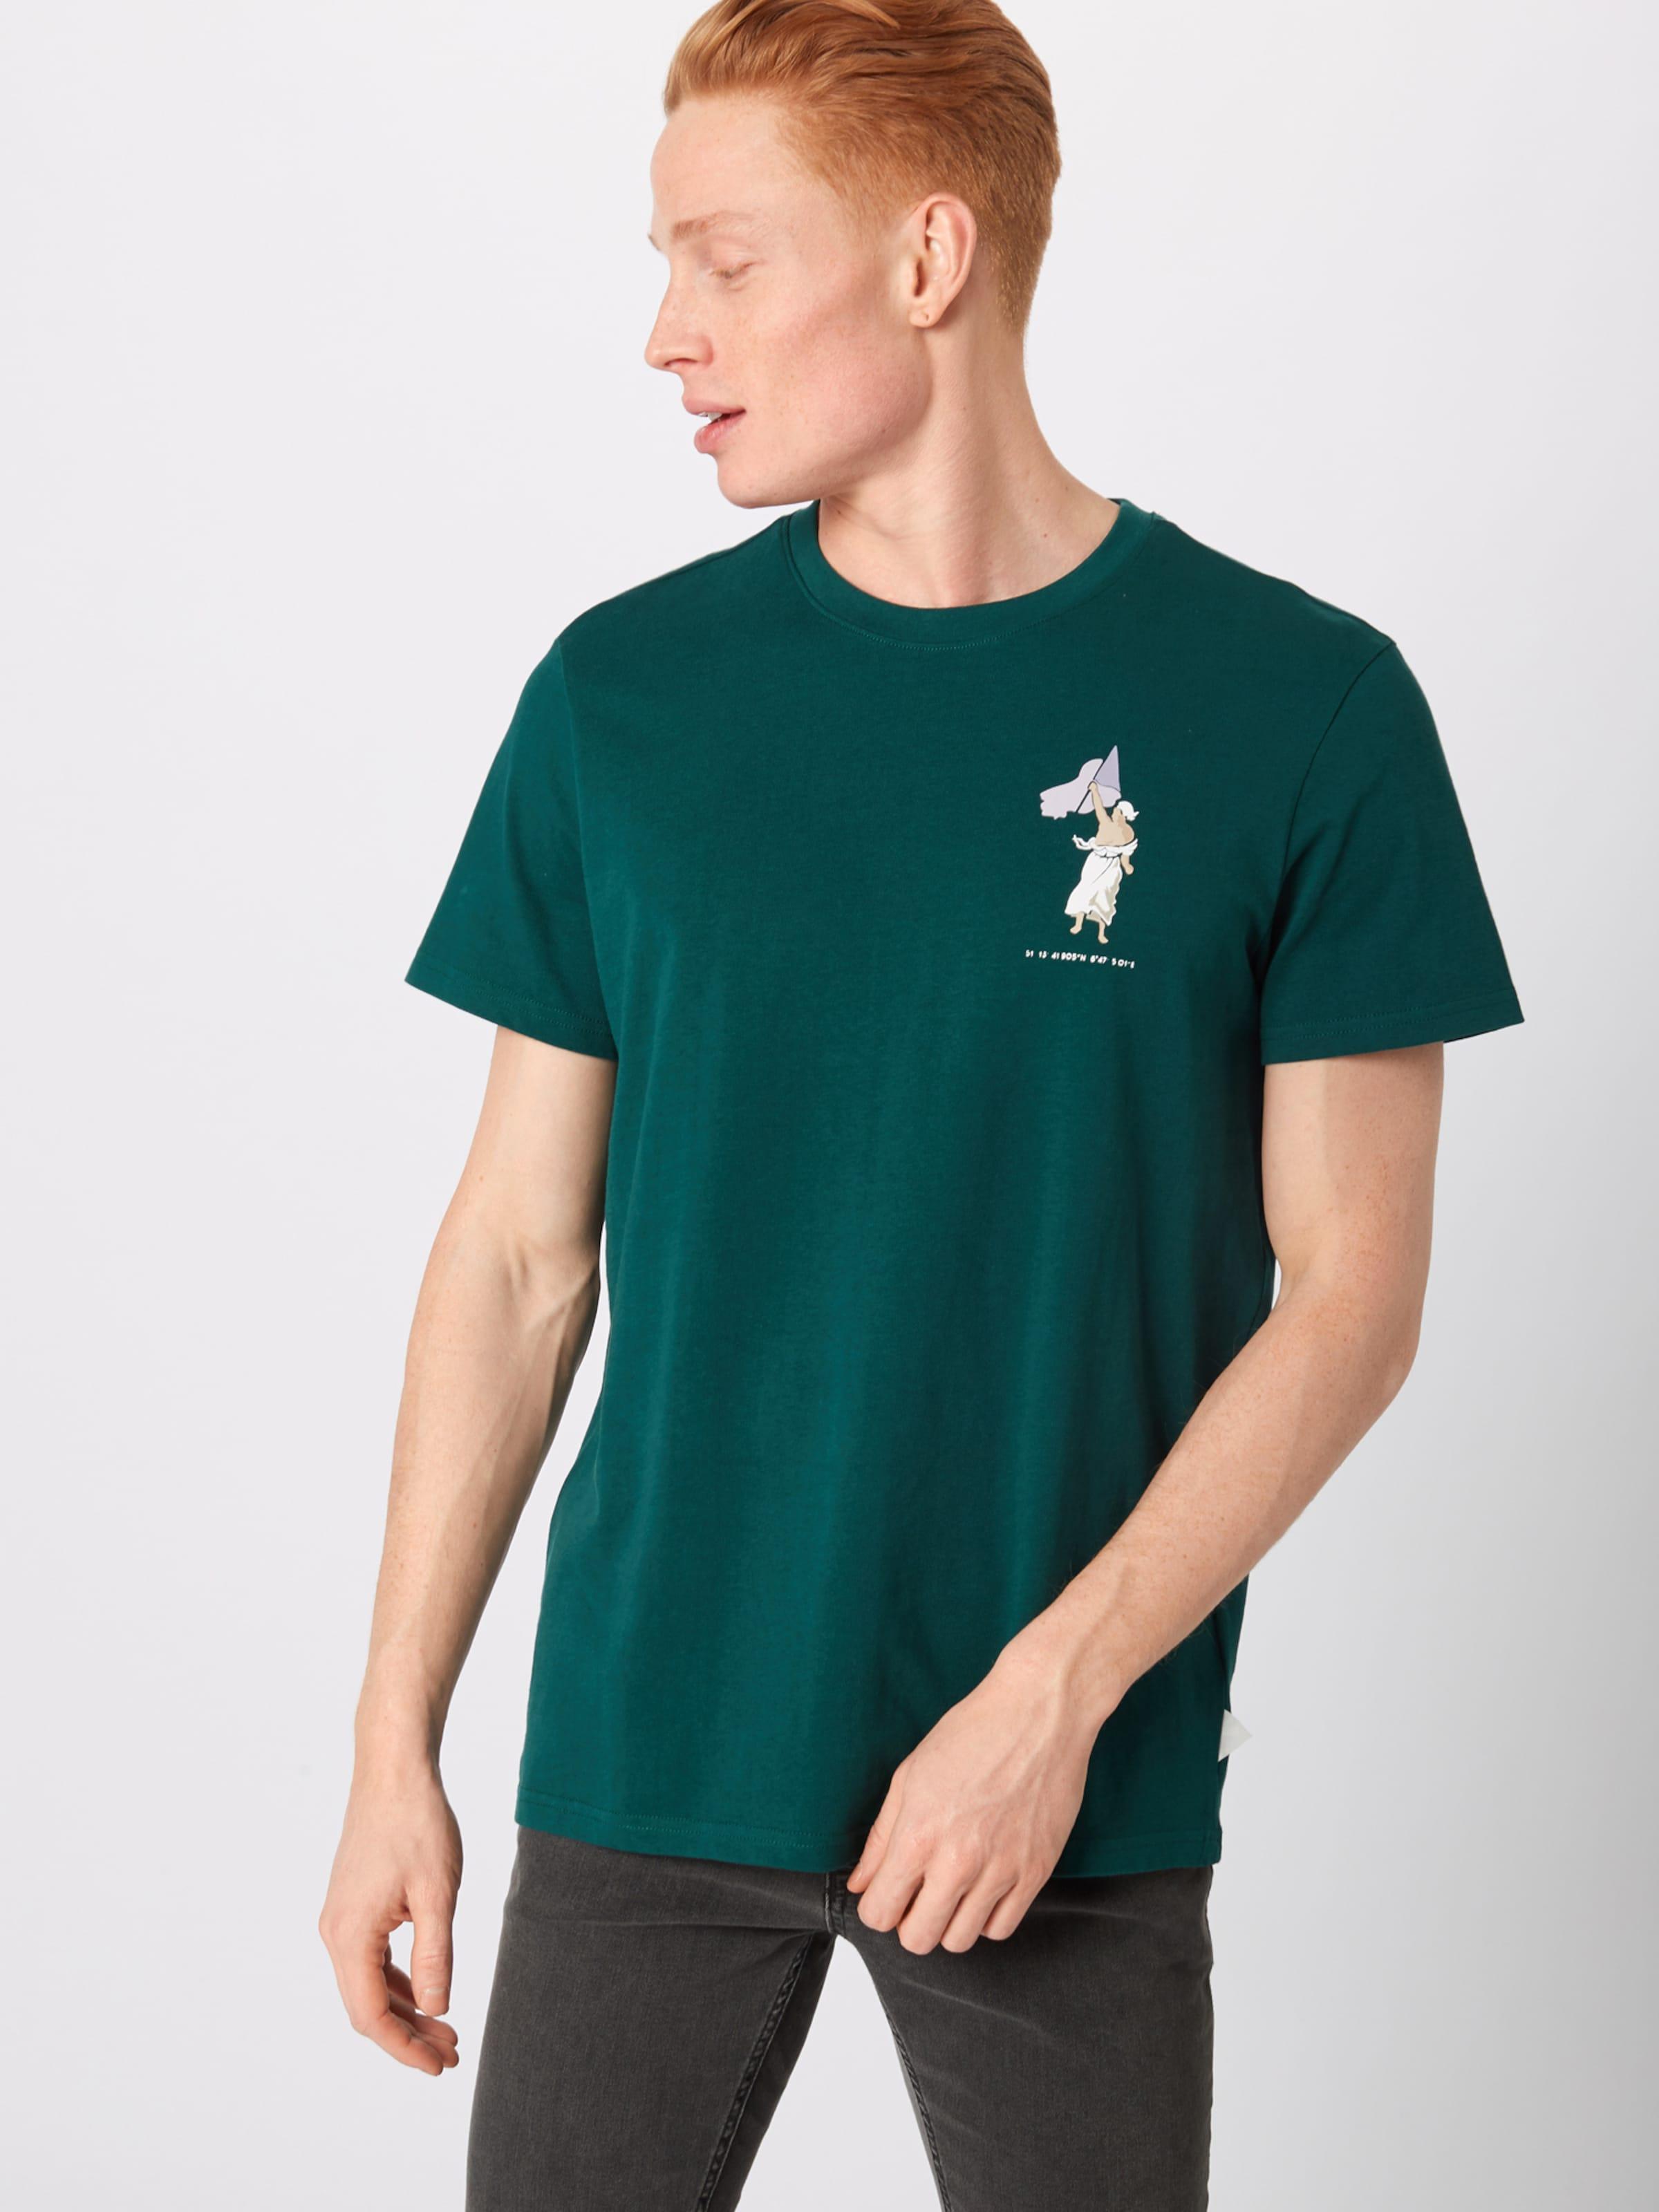 shirt 'liberte' T Review En Blanc 5L3jRqS4cA